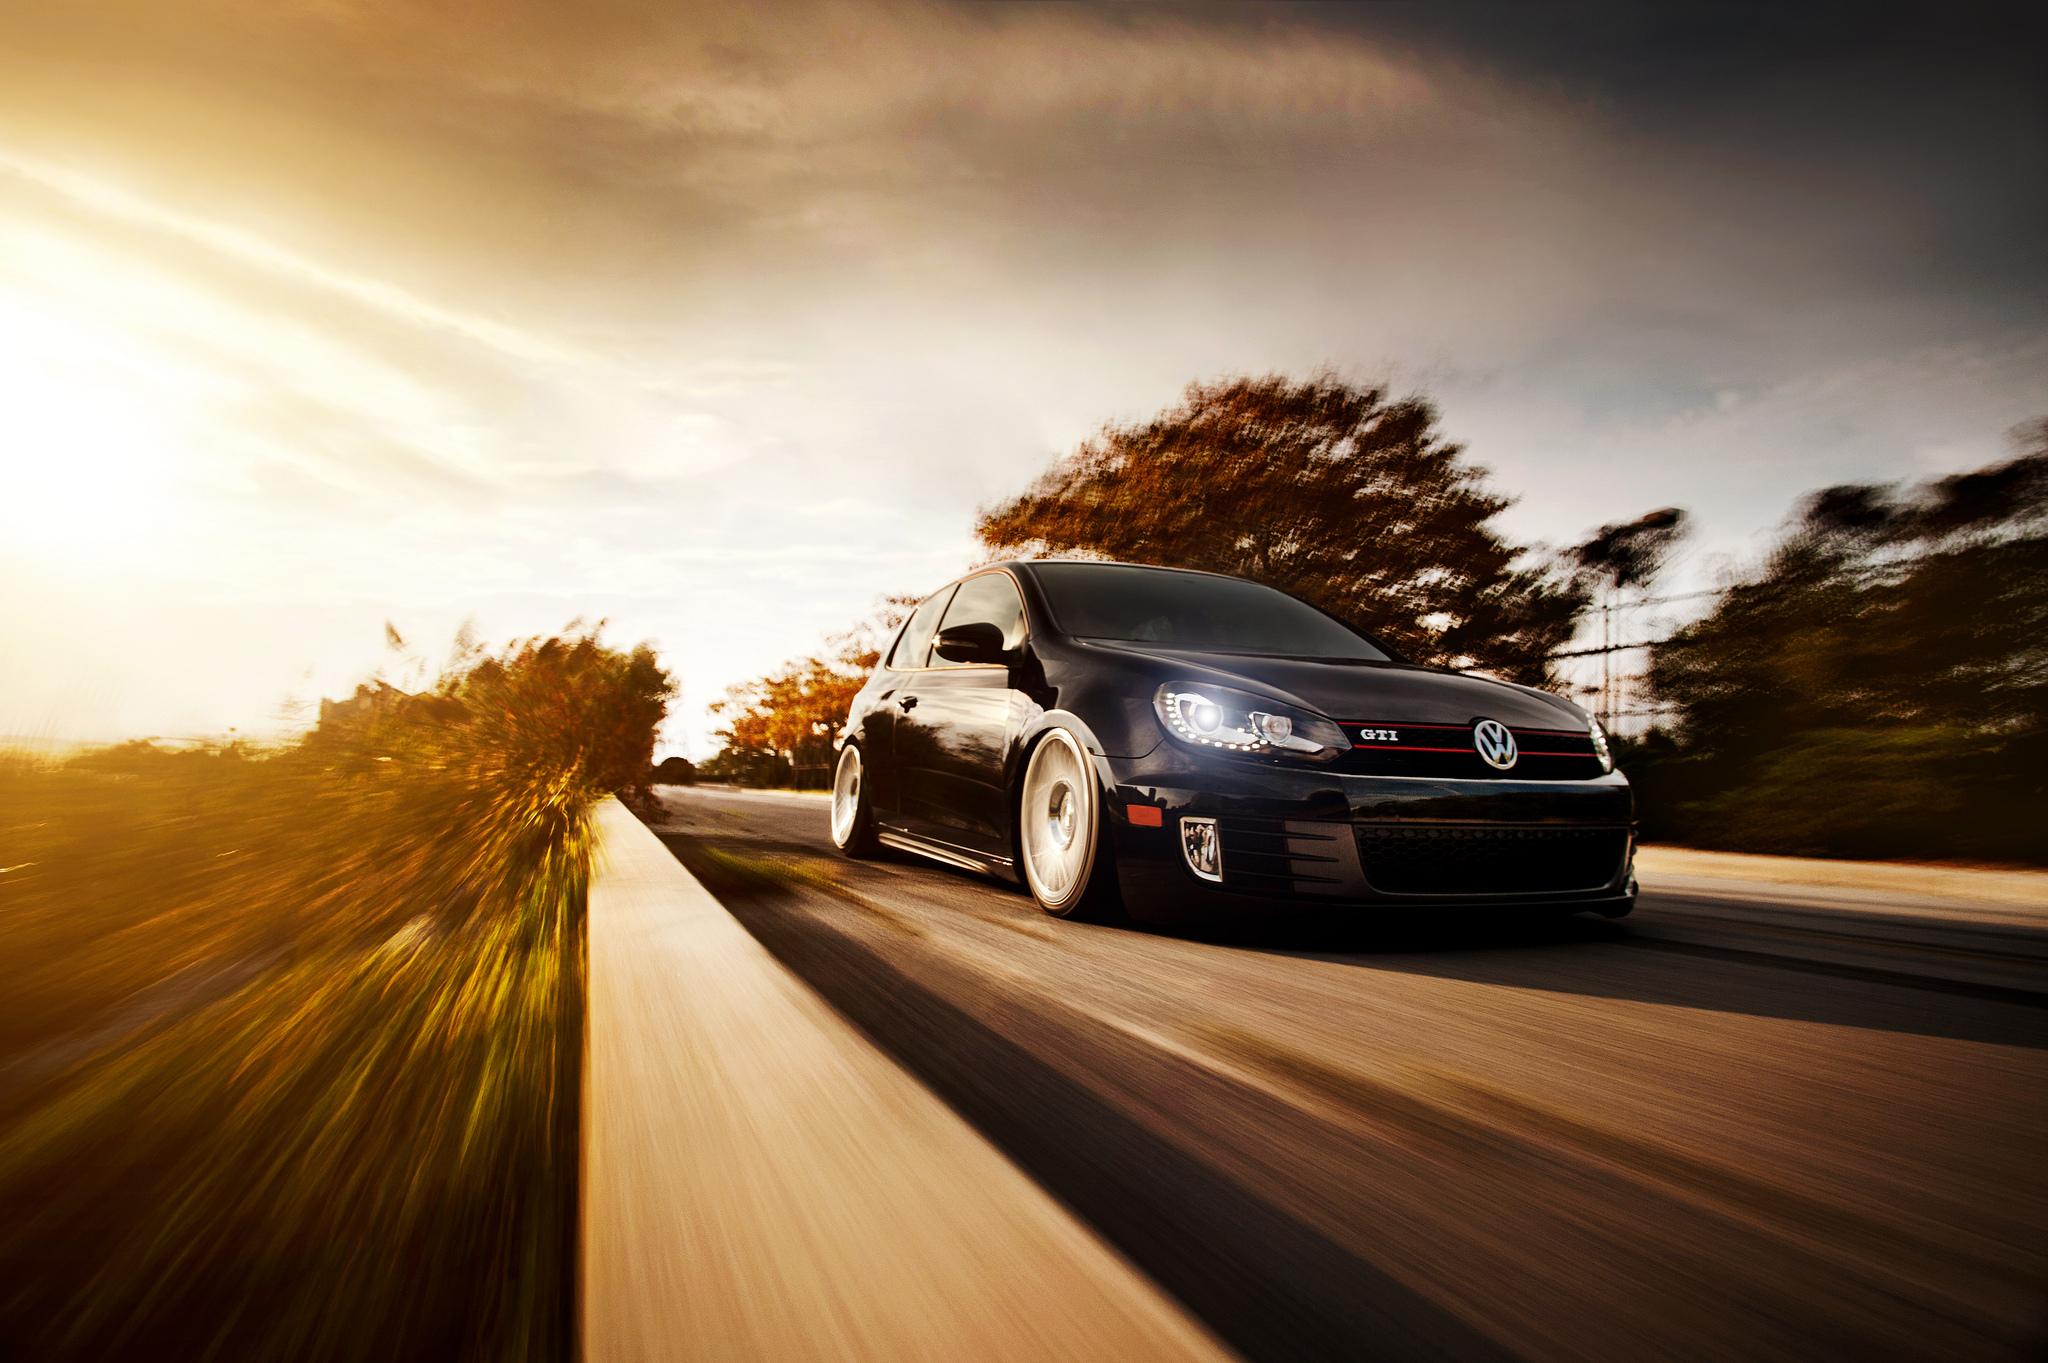 Download Volkswagen Golf GTI On The Road Wallpaper Wallpapers 2048x1363